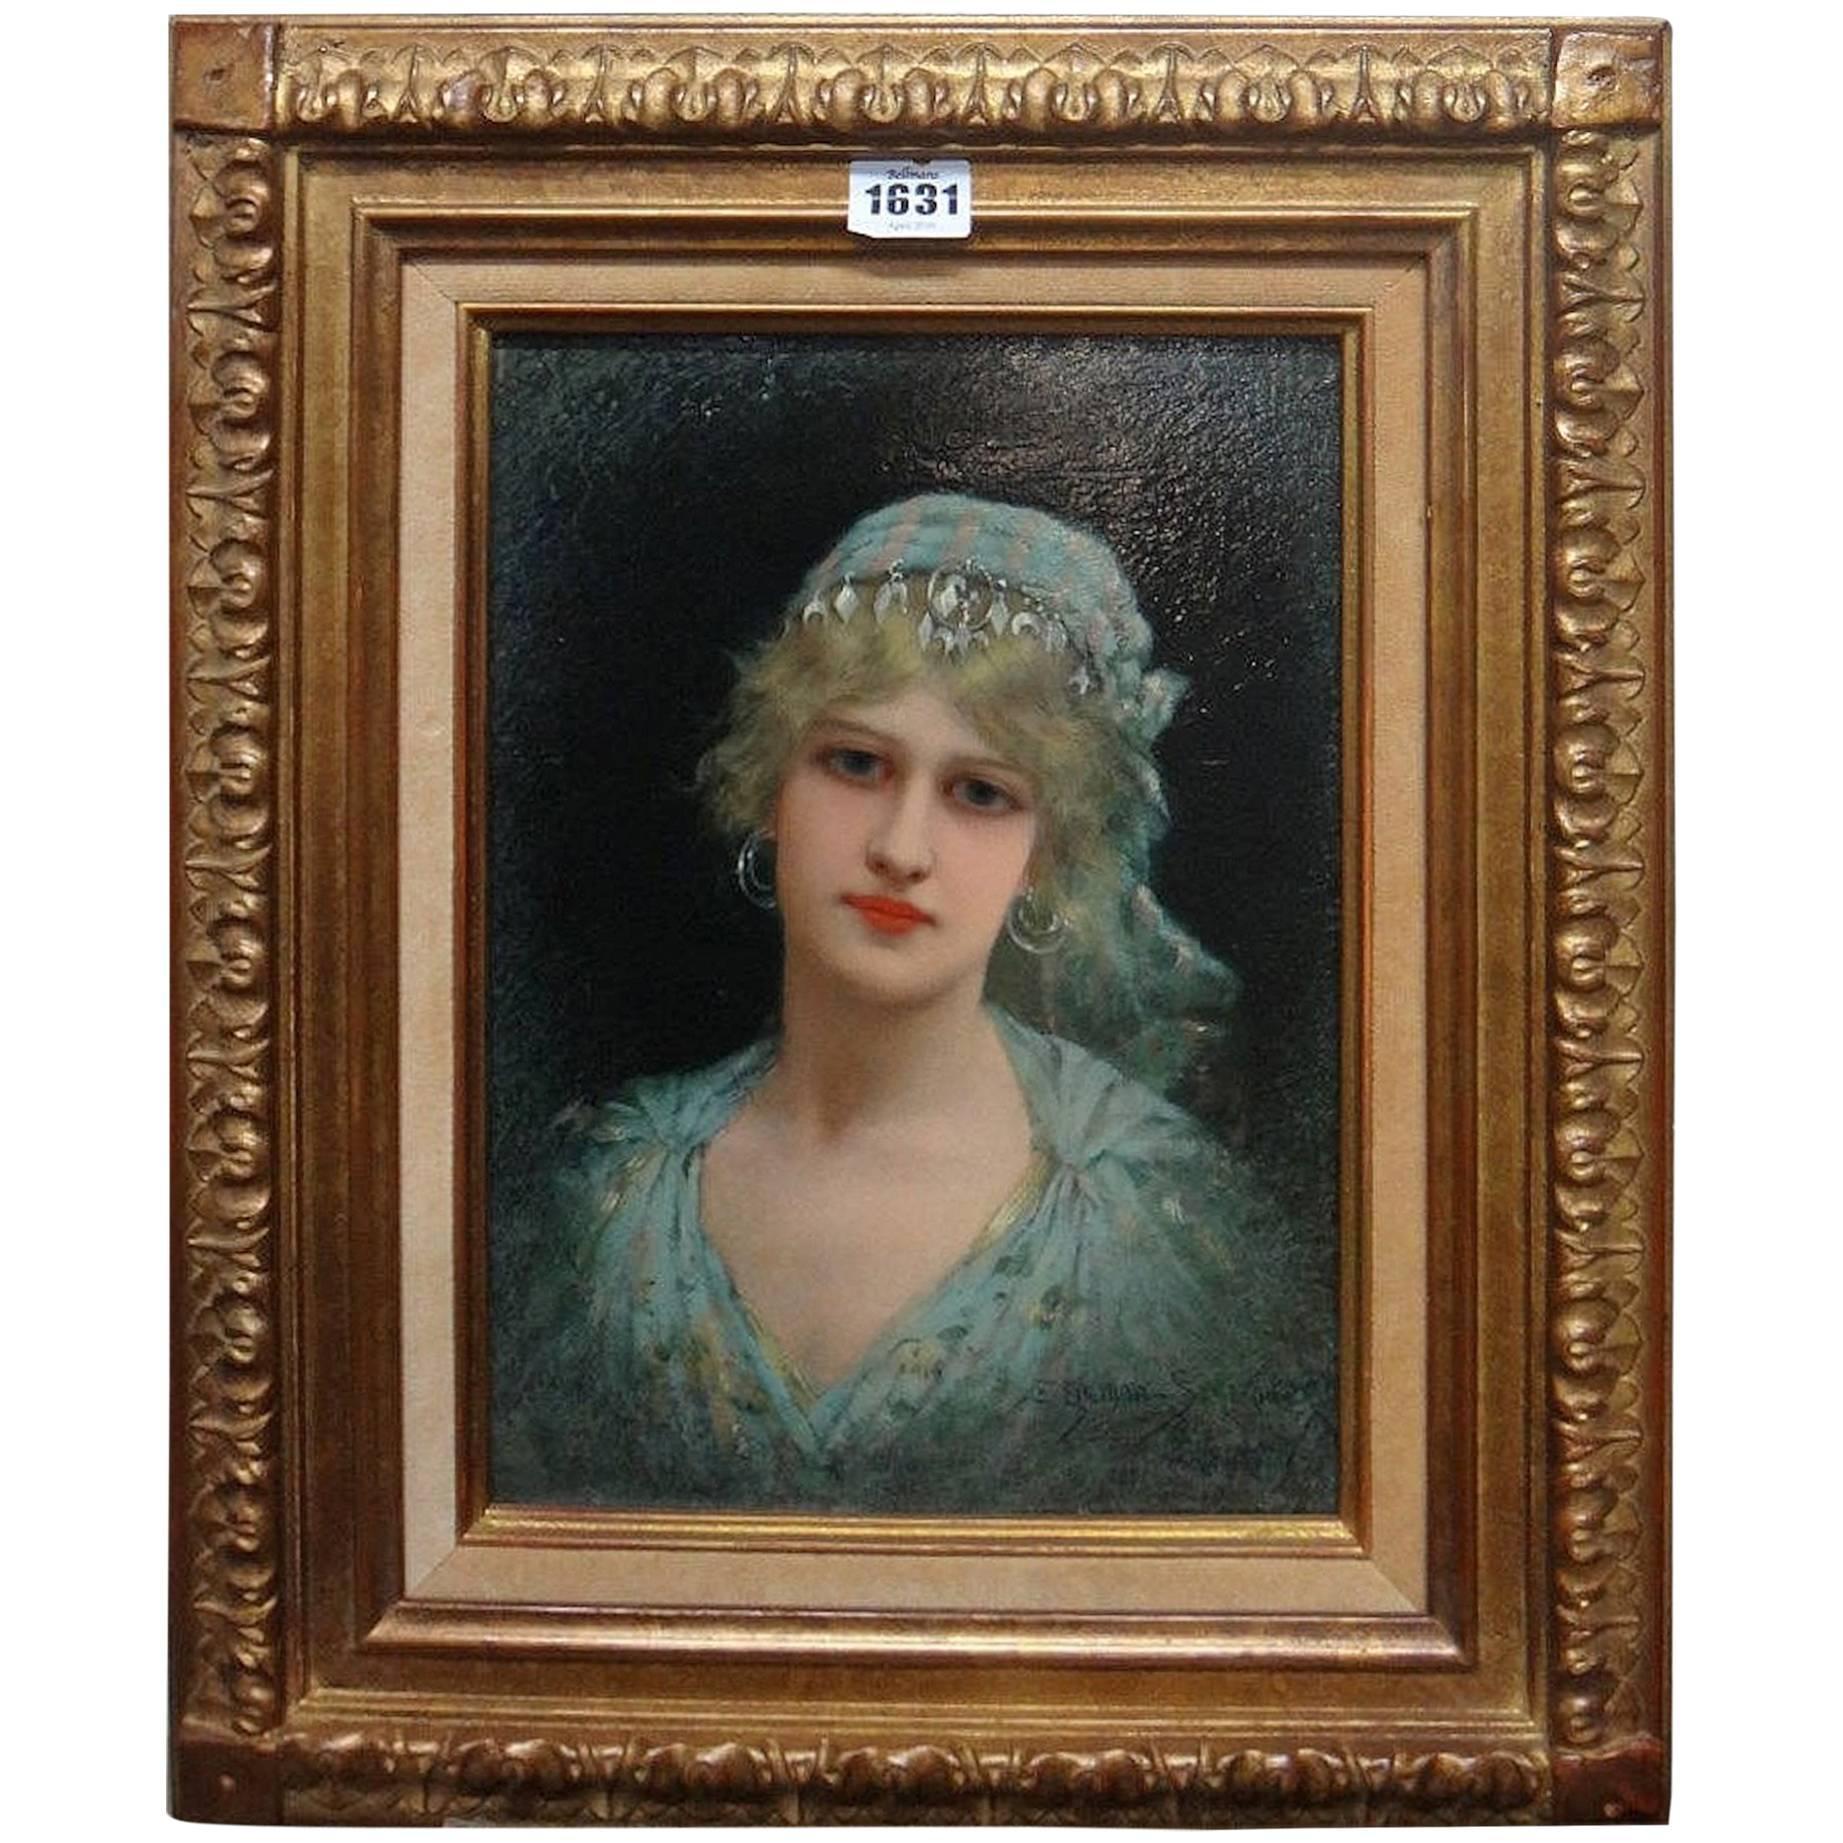 Émile Eisman-Semenowsky, Portrait of a Lady in Eastern Dress